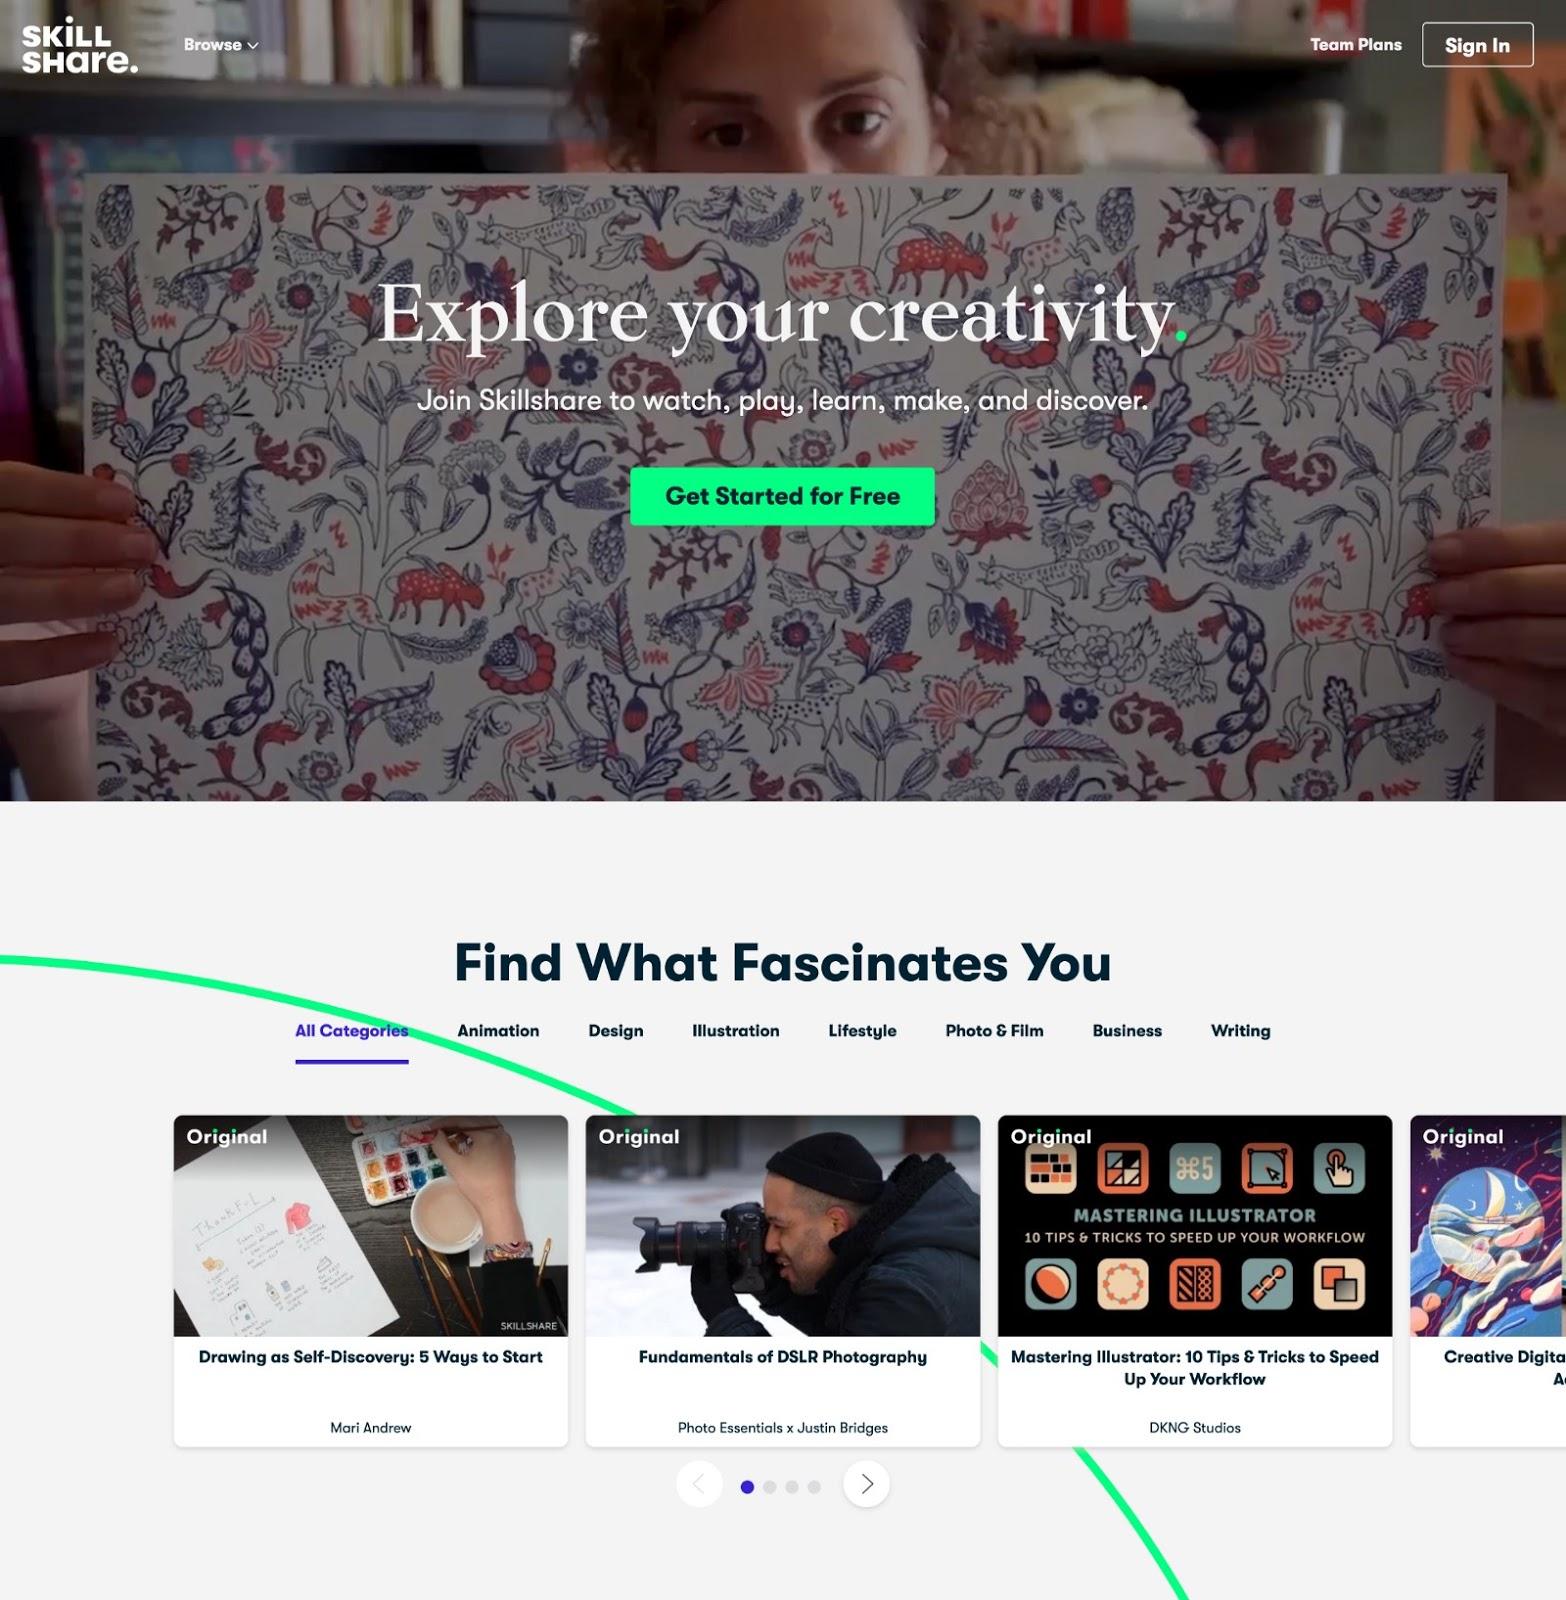 Example of a membership website (Skillshare.com)